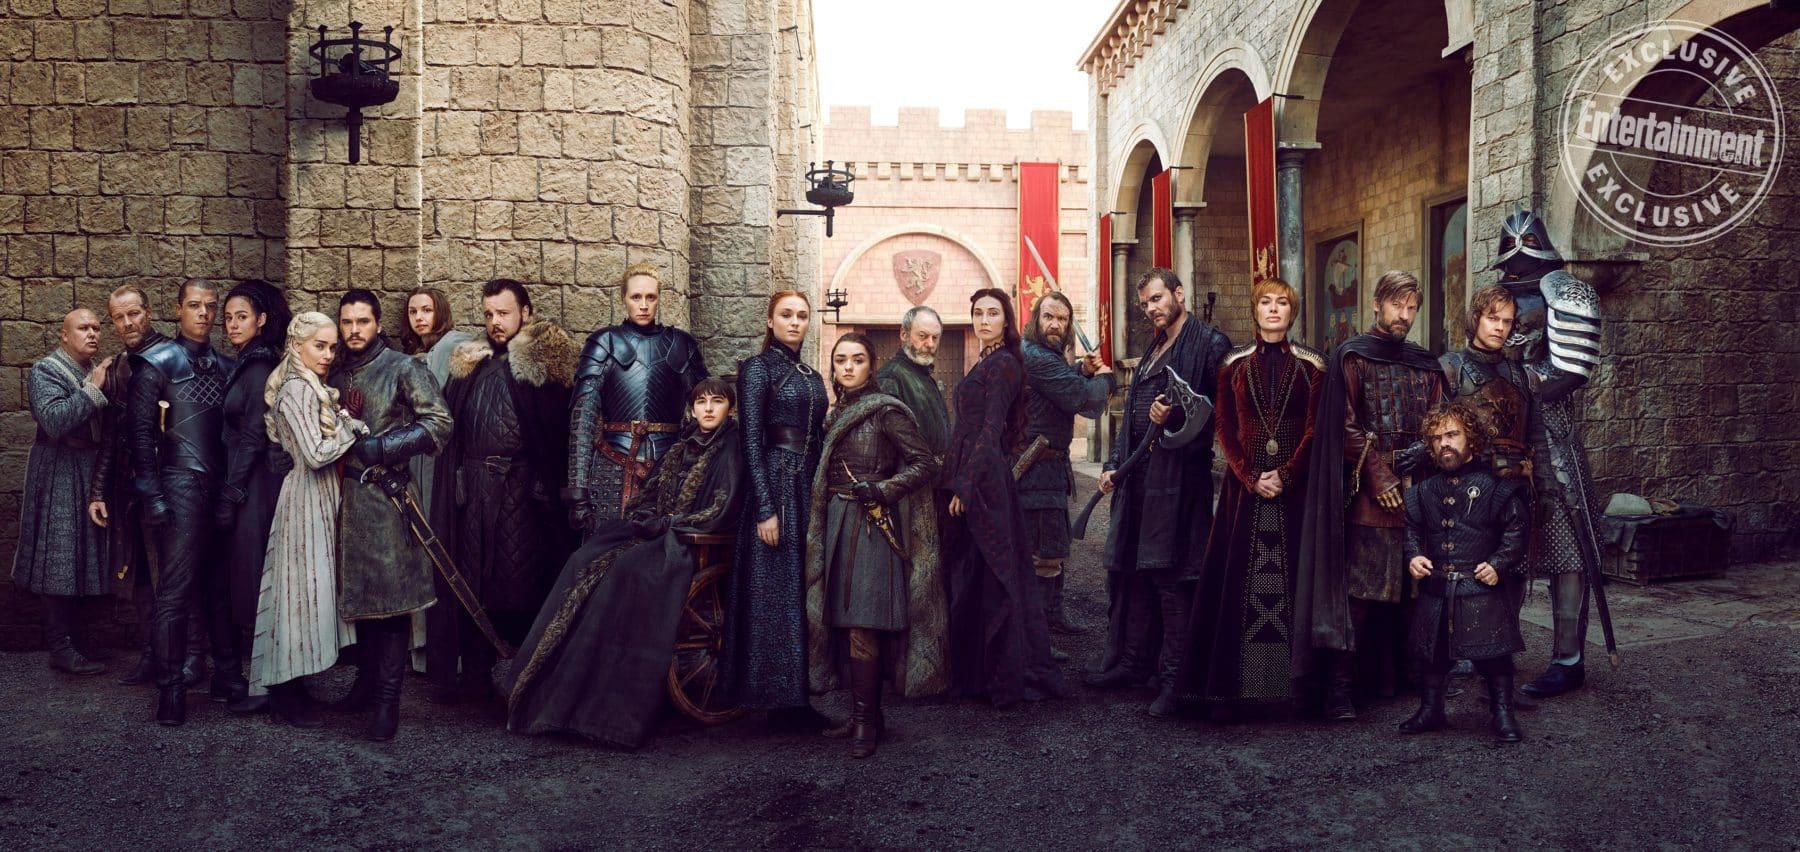 Game of Thrones: tráiler de octava temporada rompe récord de visualizaciones de HBO